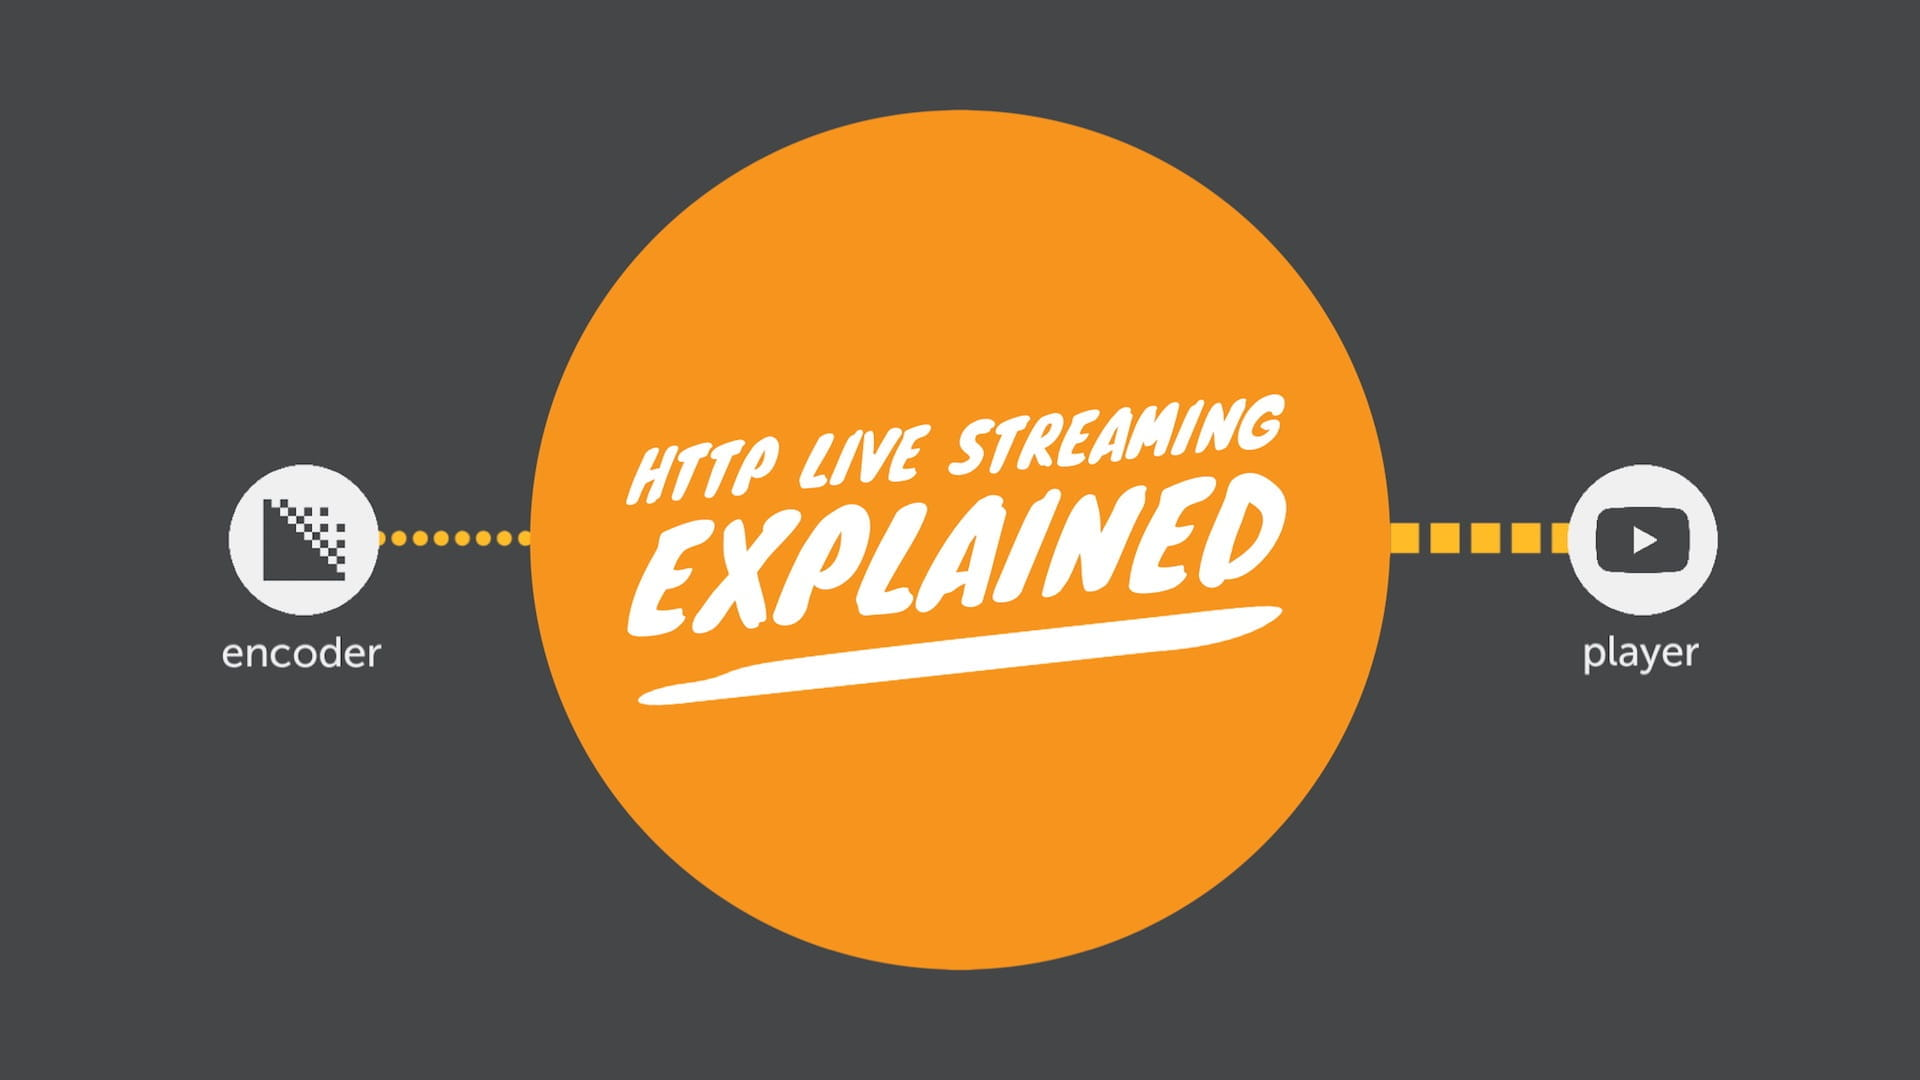 HLS (HTTP Live Streaming)とは何か? [ Wowza Blog 翻訳 ]